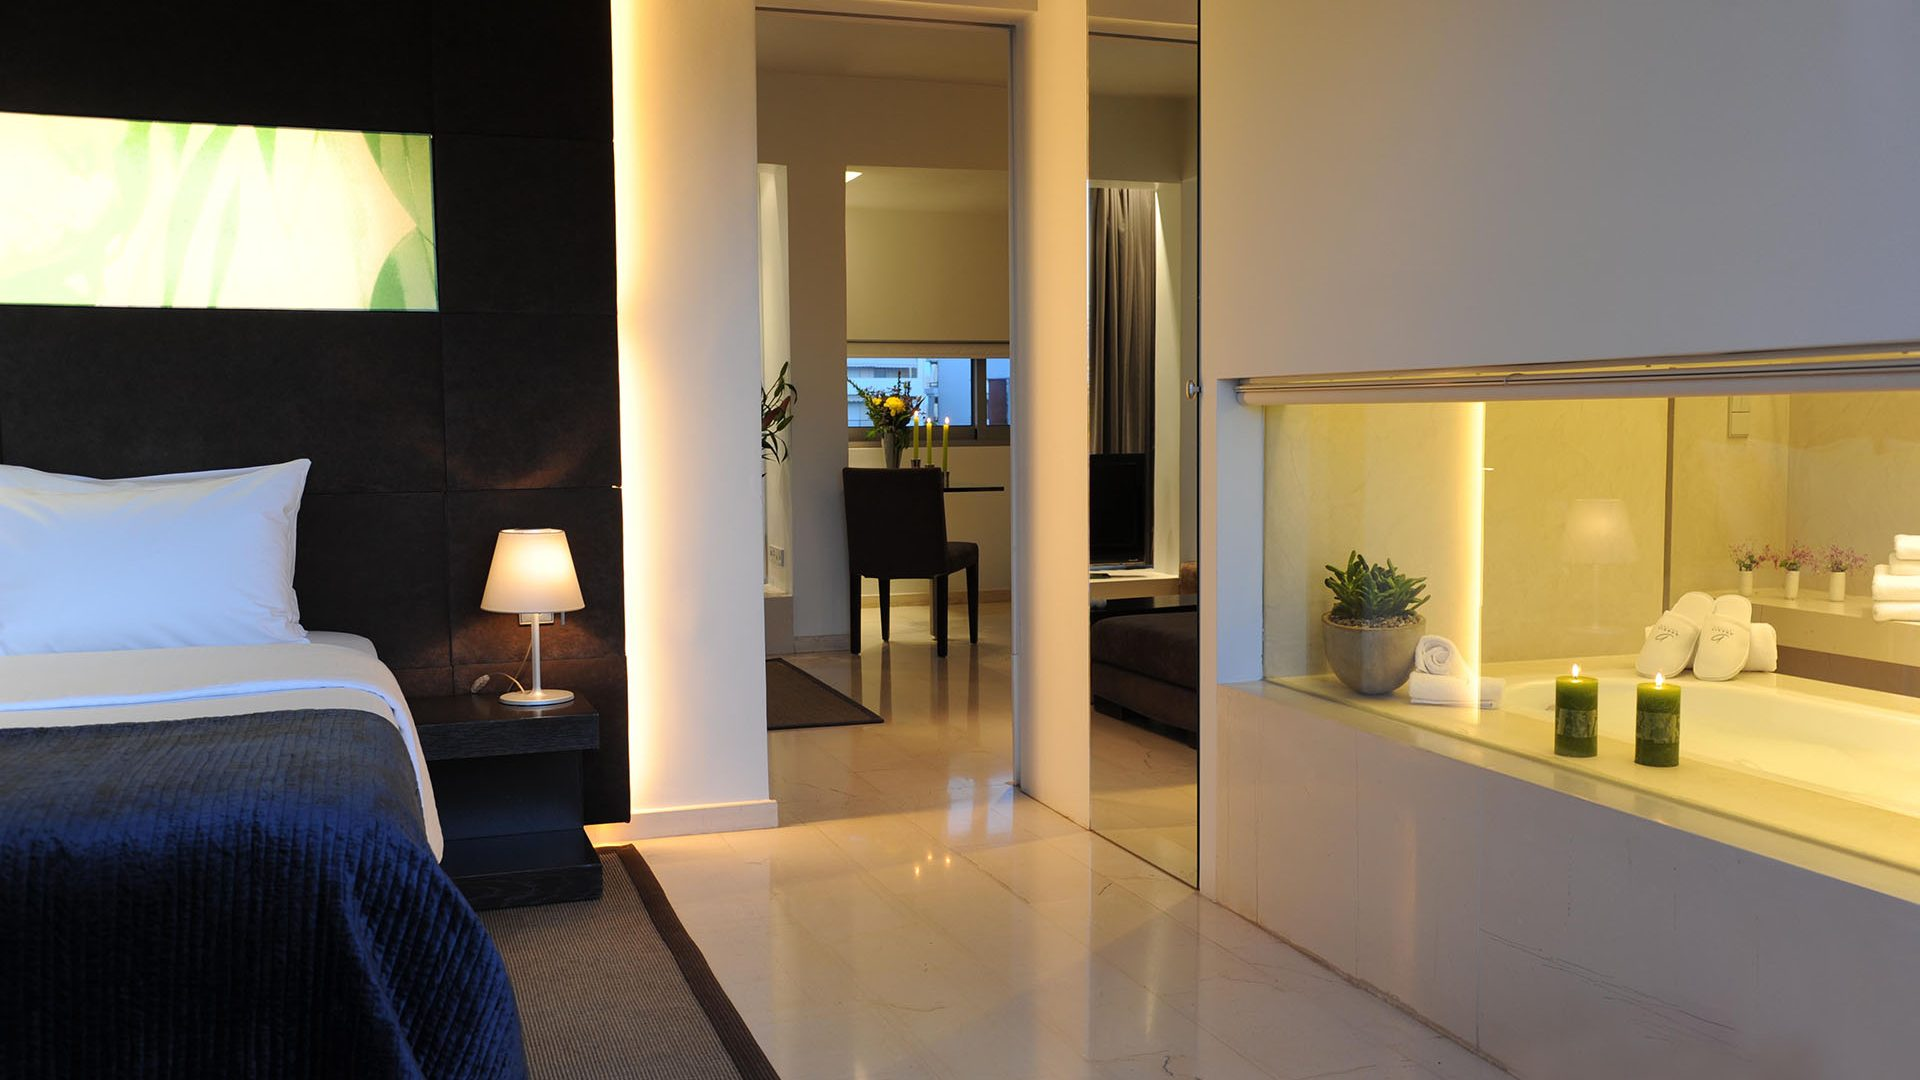 athens glyfada hotels - Brasil Suites